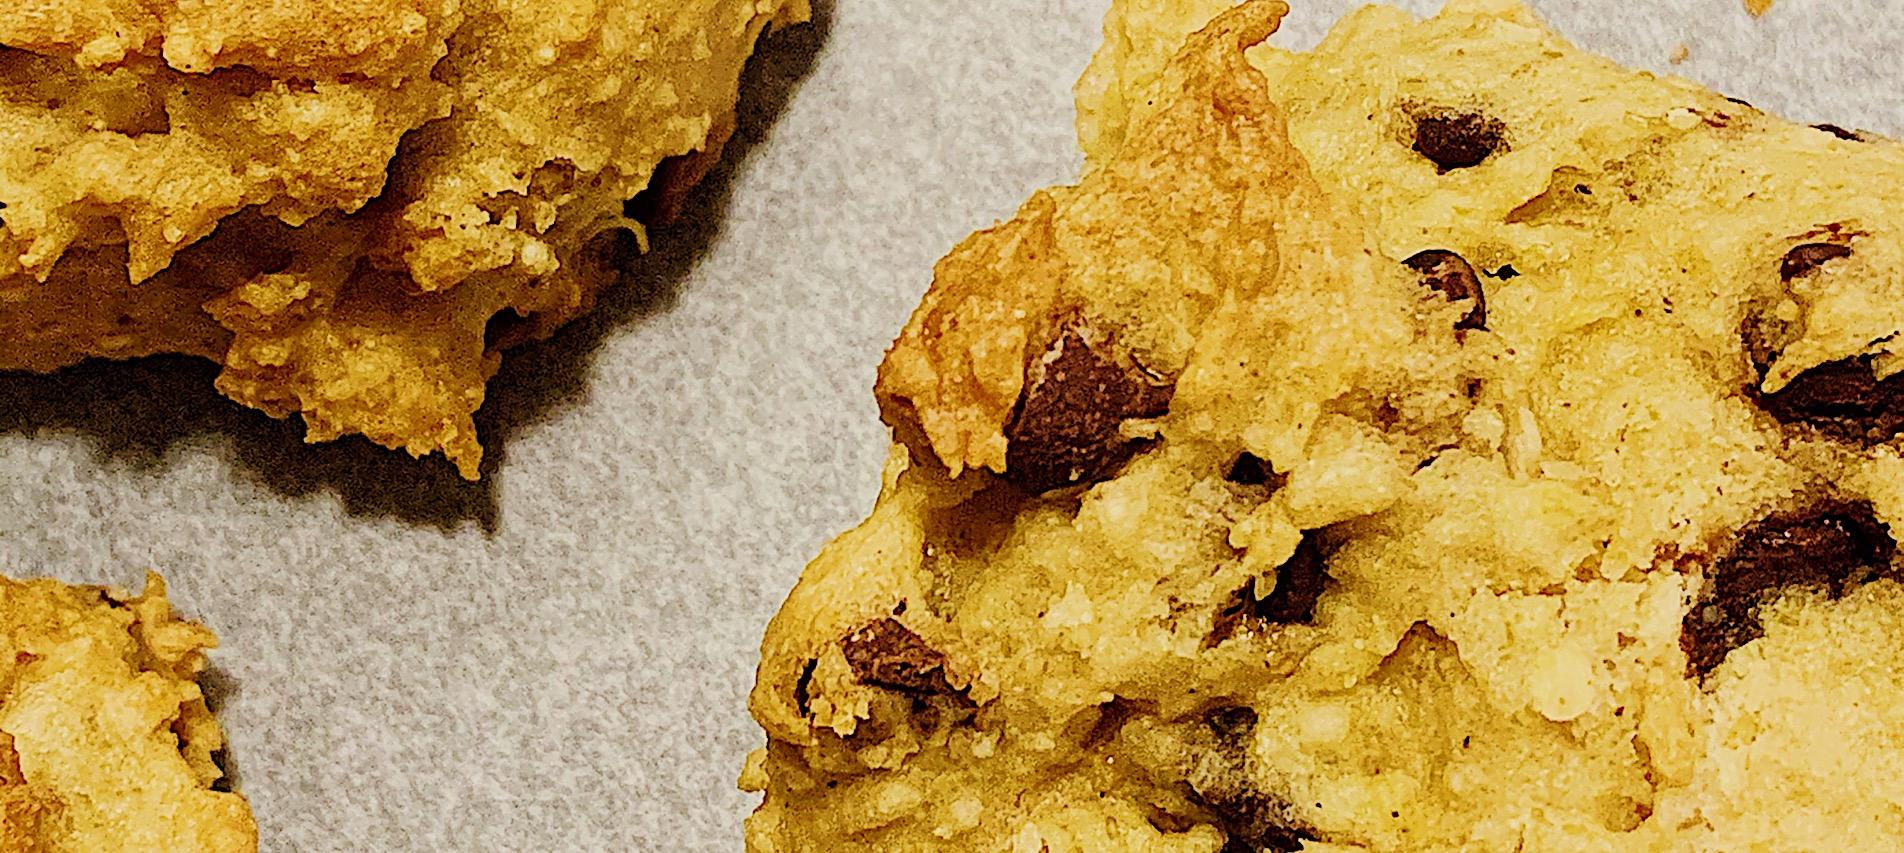 Recettes de biscuits